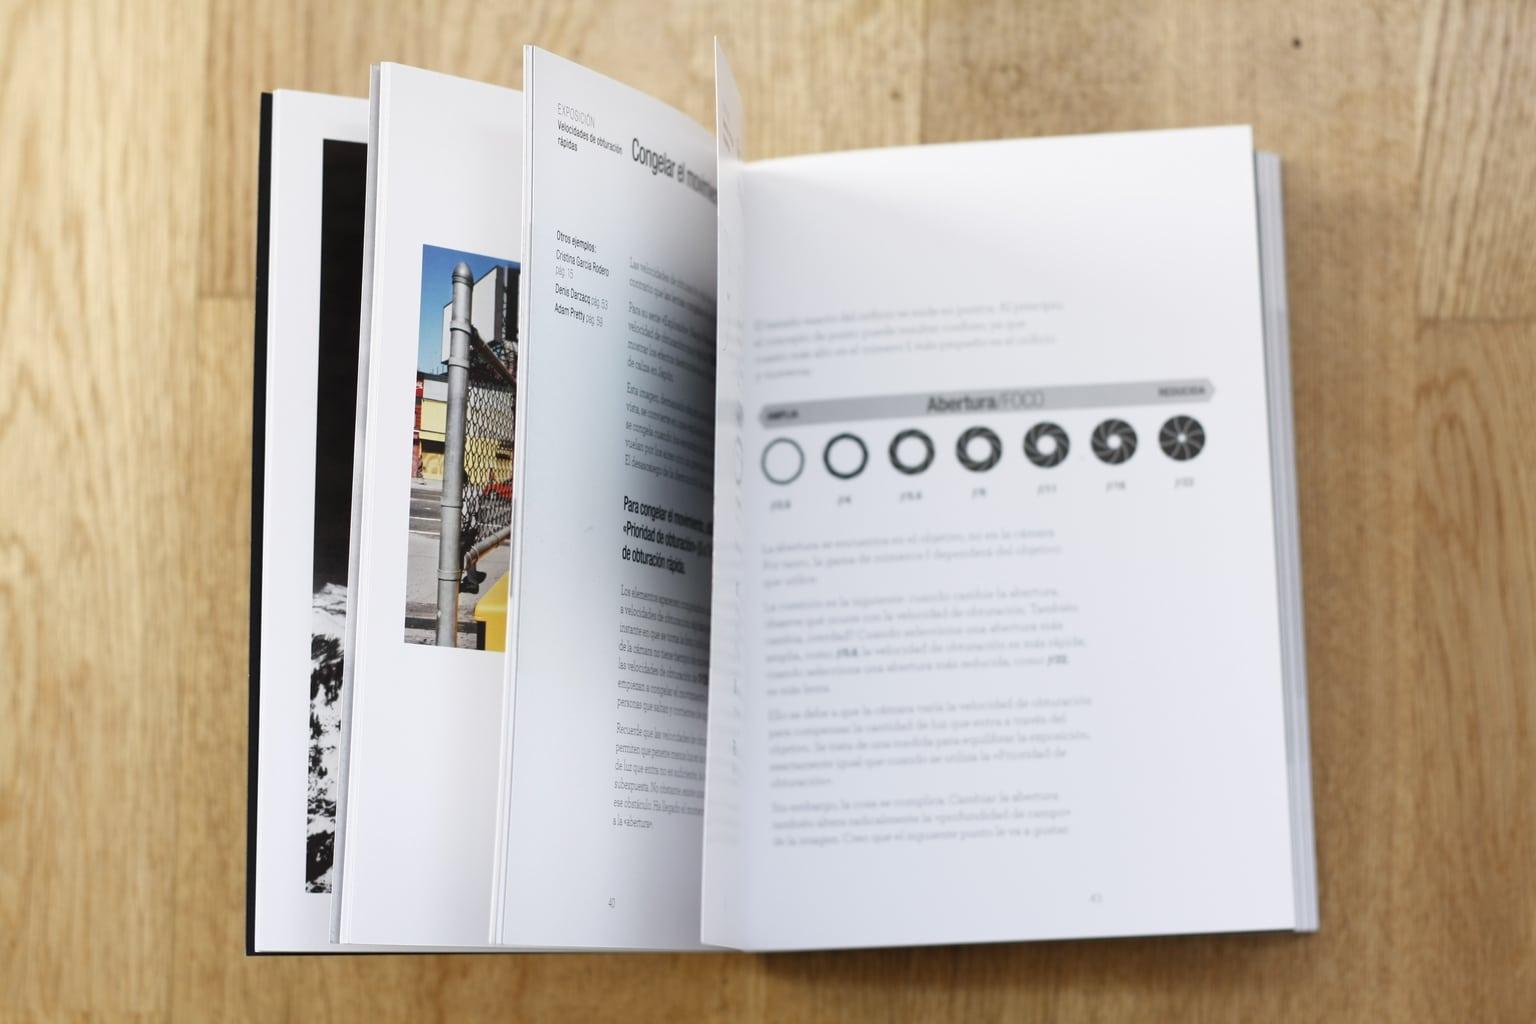 Libro Lea este libro si desea tomar buenas fotografías